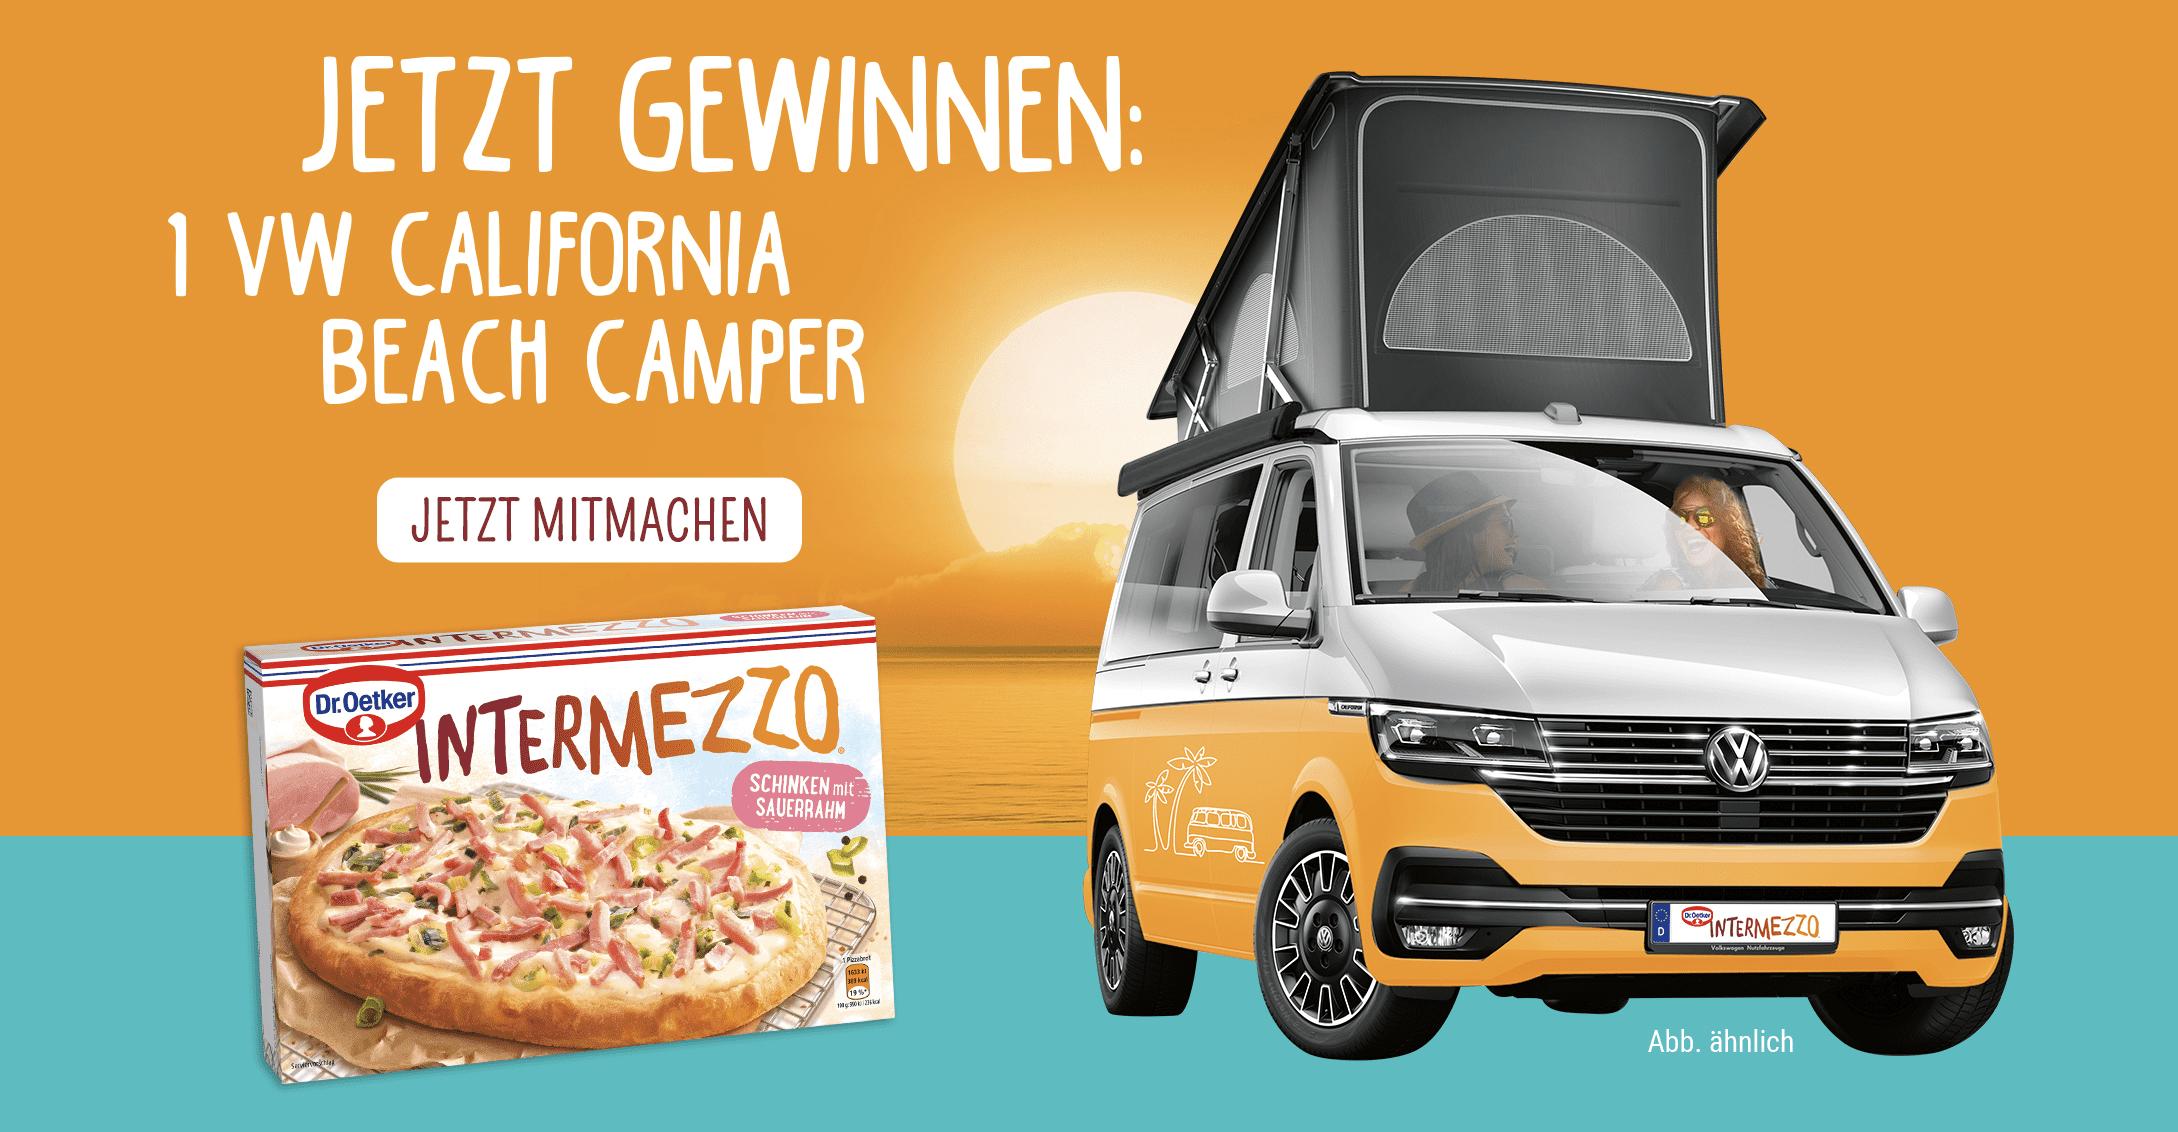 Dr. Oetker Intermezzo-Pizza: VW California Beach Camper gewinnen